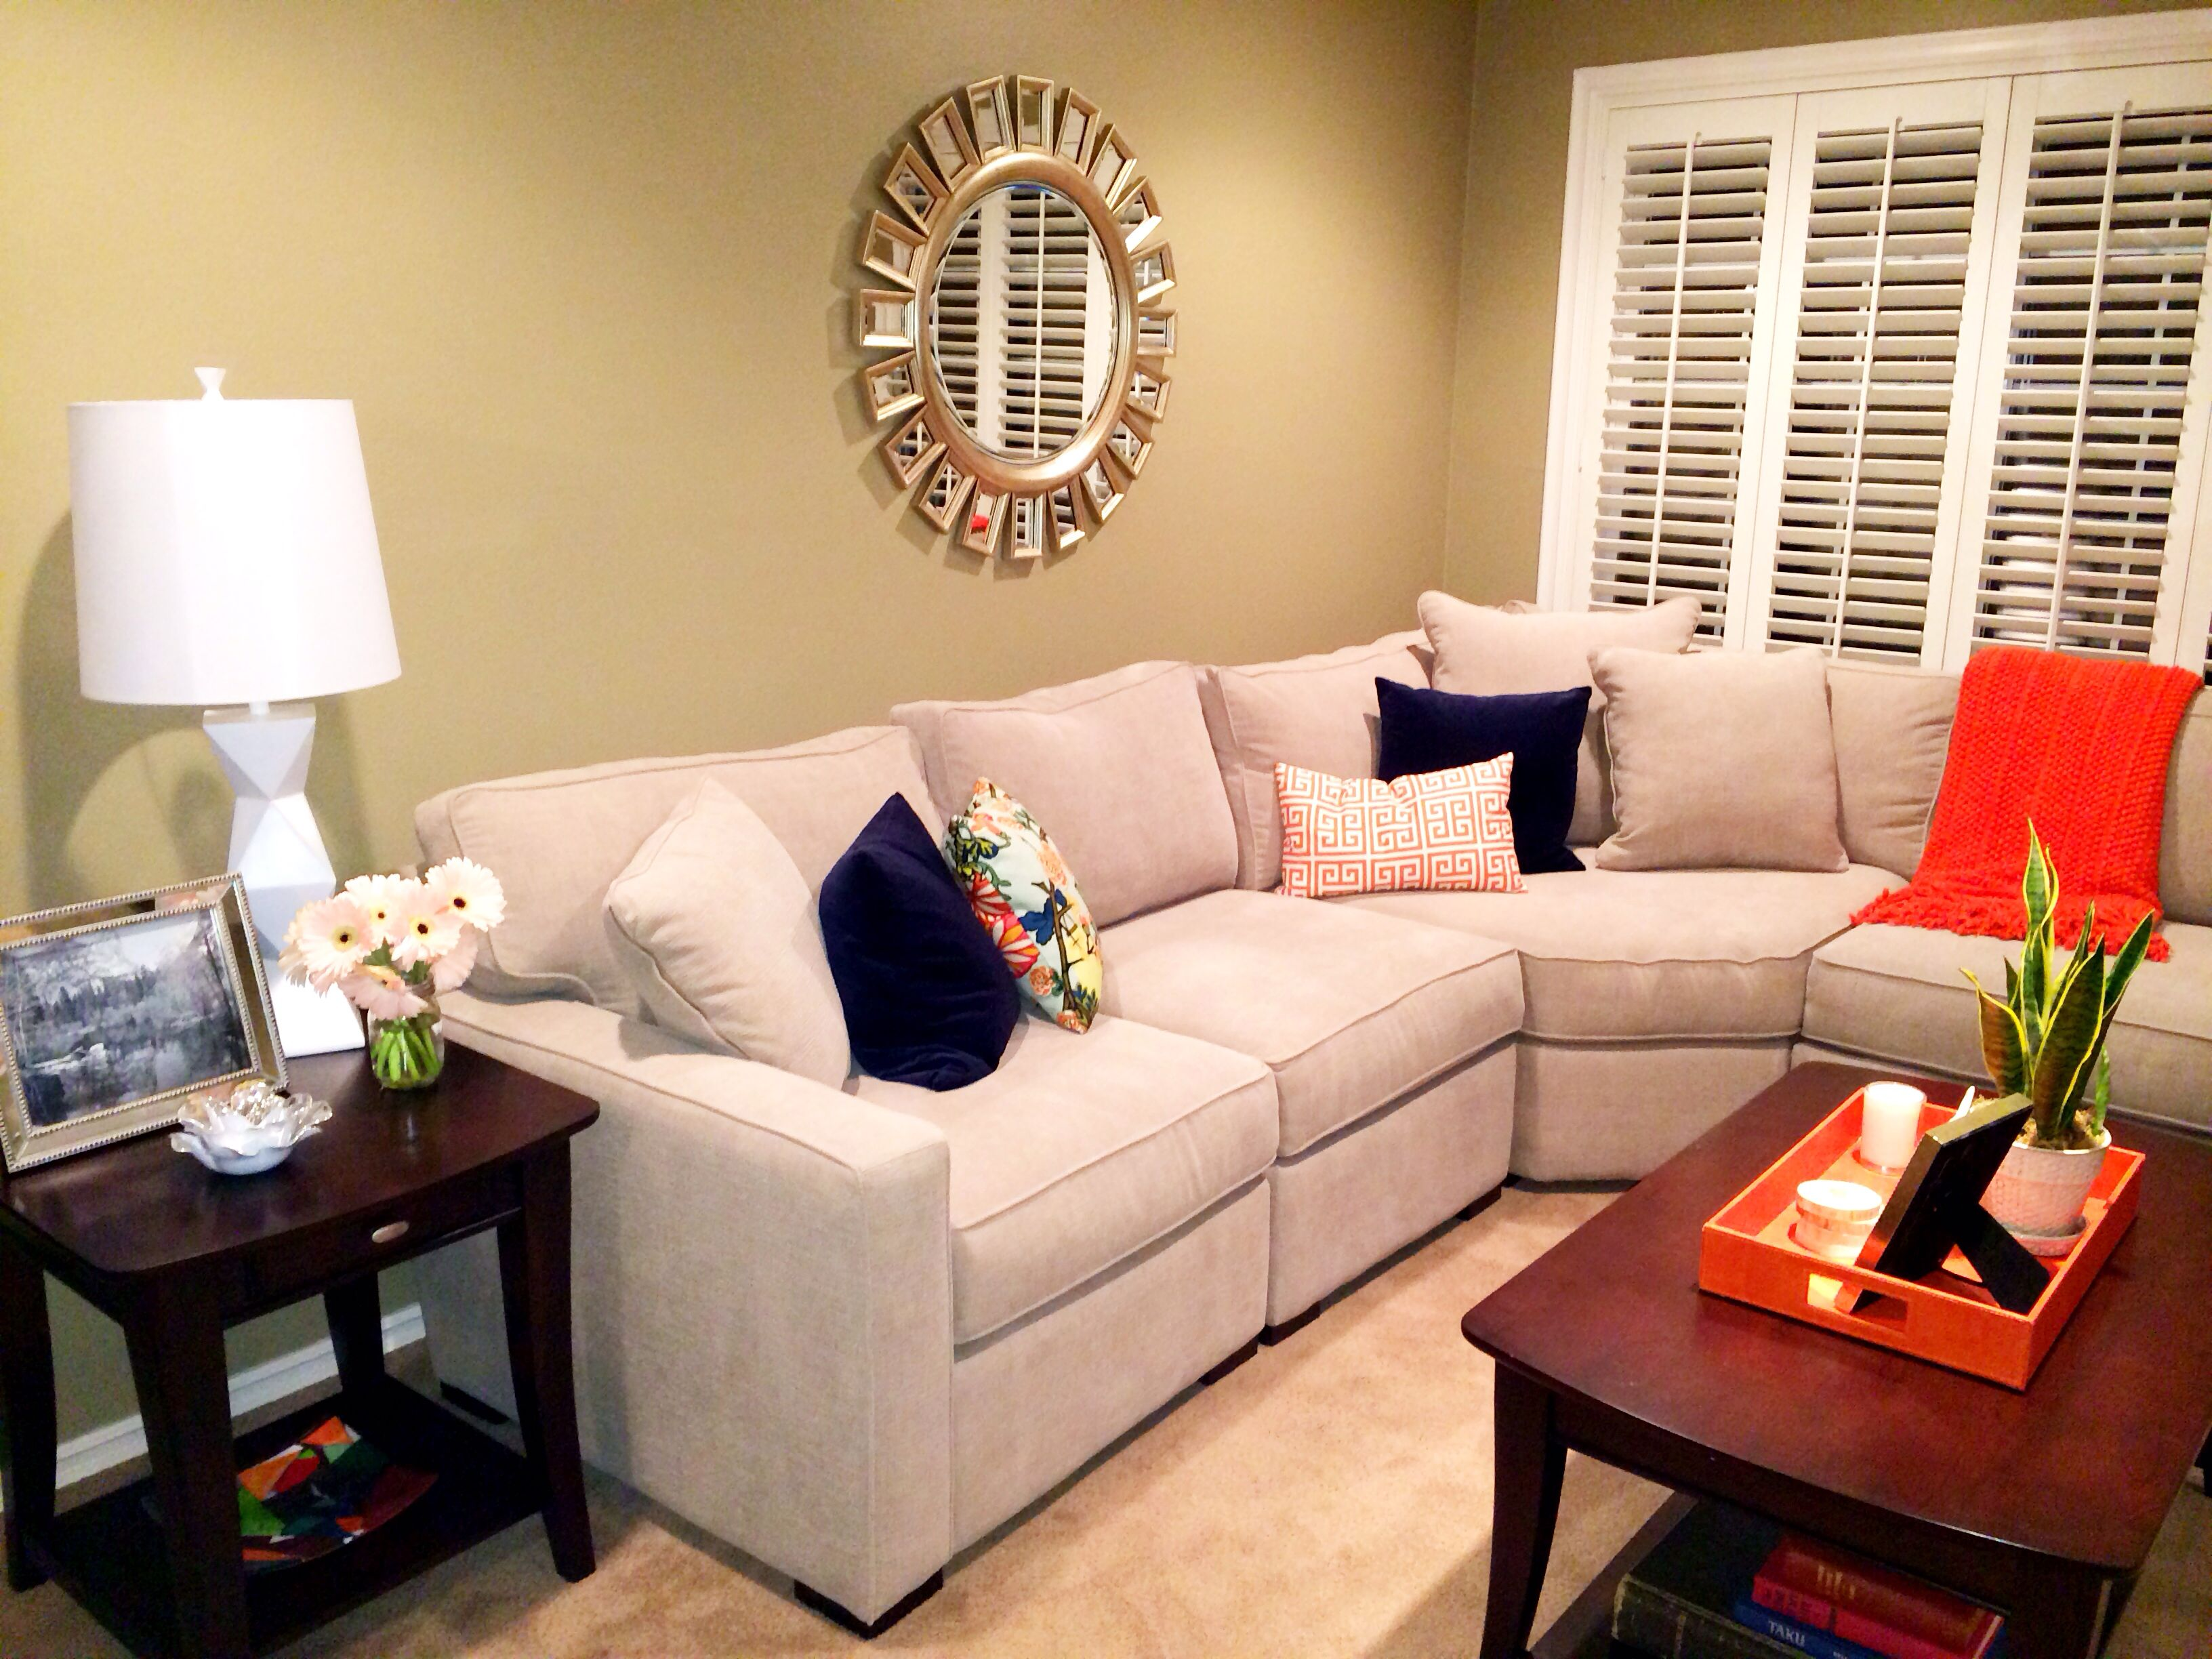 Living room in progress radley sectional sofa from macy39s for Radley sectional sofa macy s